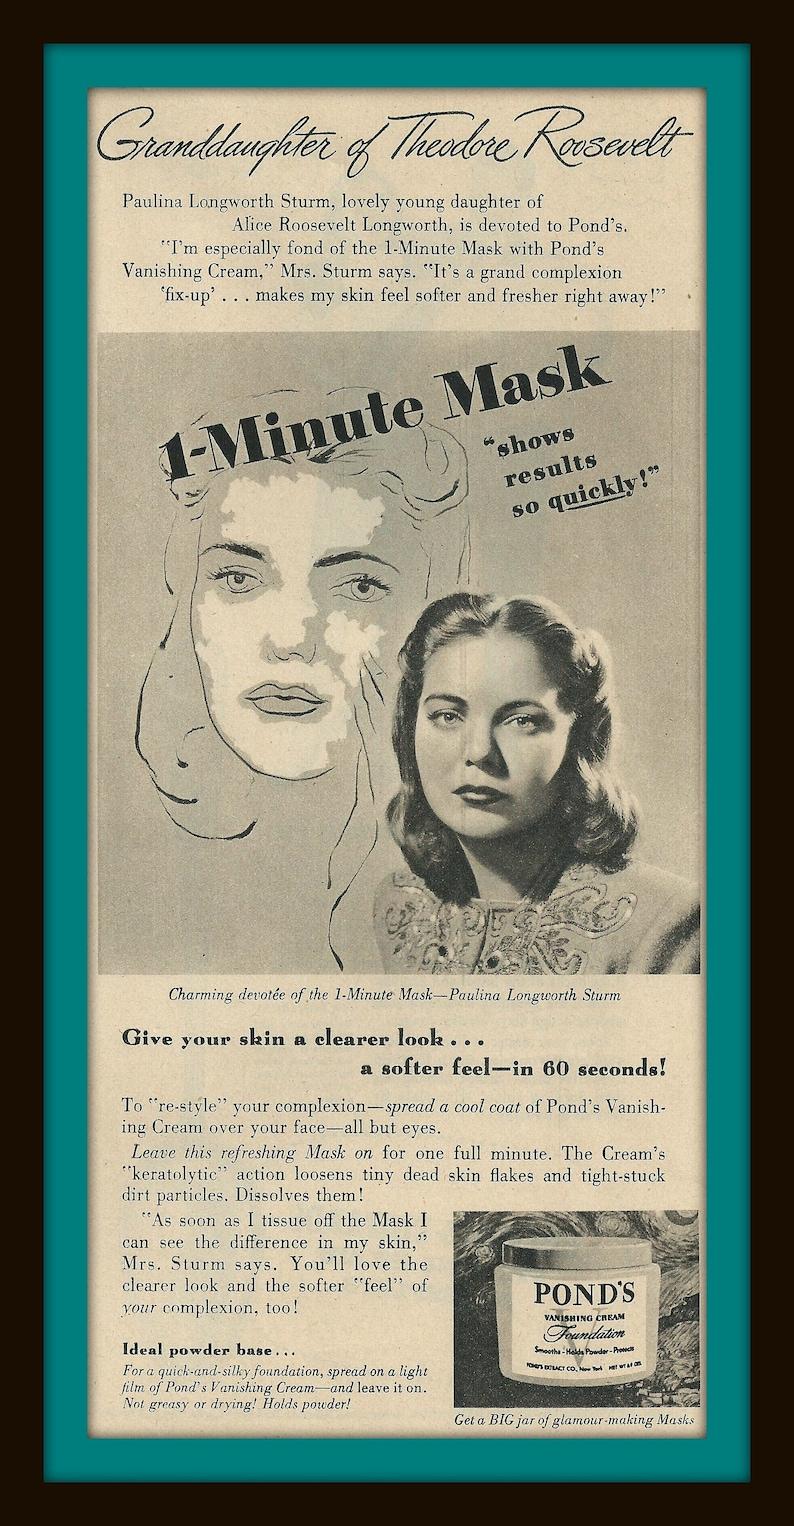 1945 Pond S 1 Minute Mask Vintage Ad Beauty Vanishing Cream Paulina Longworth Sturm Theodore Roosevelt S Granddaughter Cream